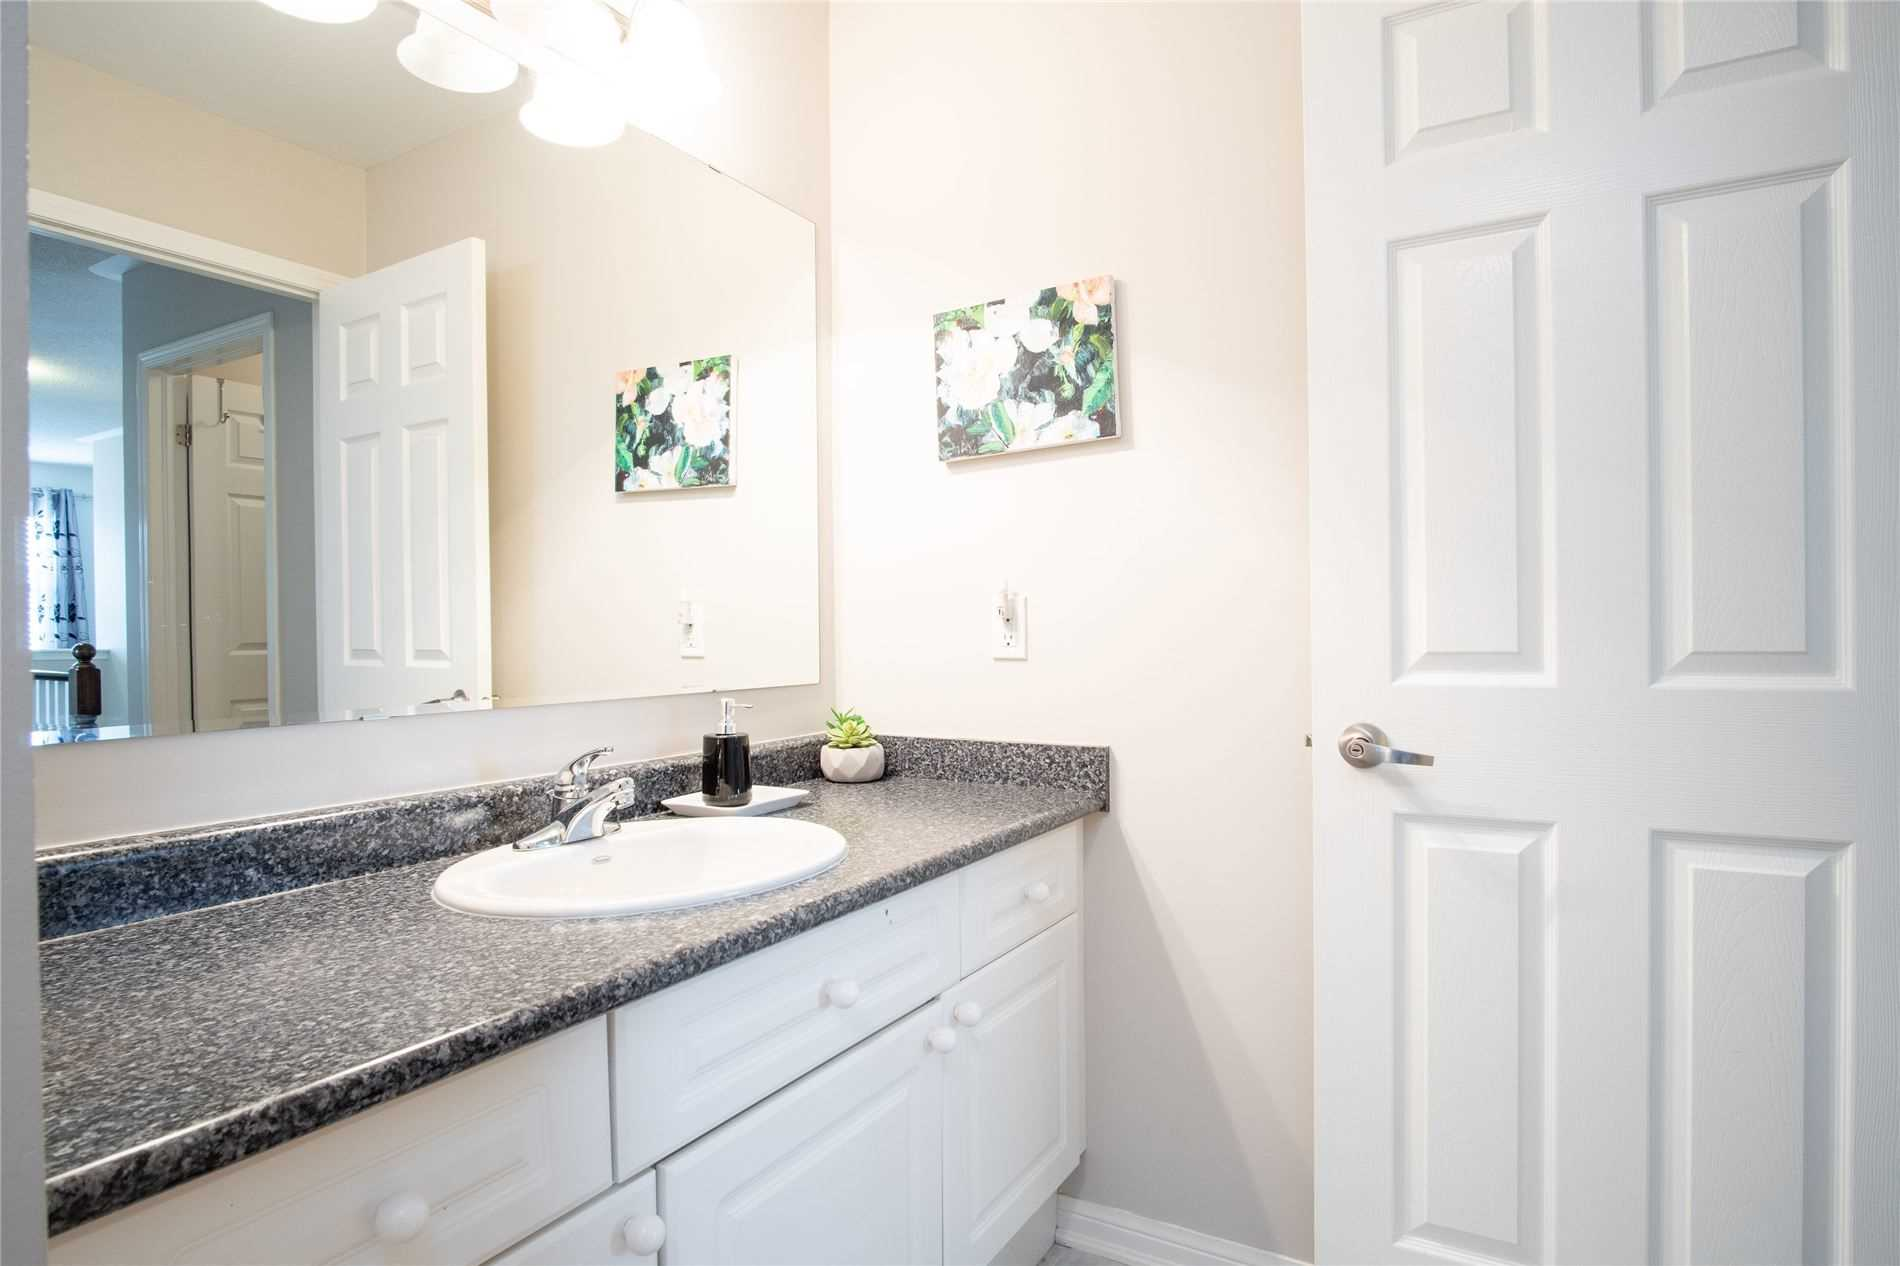 827 Biggar Hts - Coates Detached for sale, 4 Bedrooms (W5400280) - #21